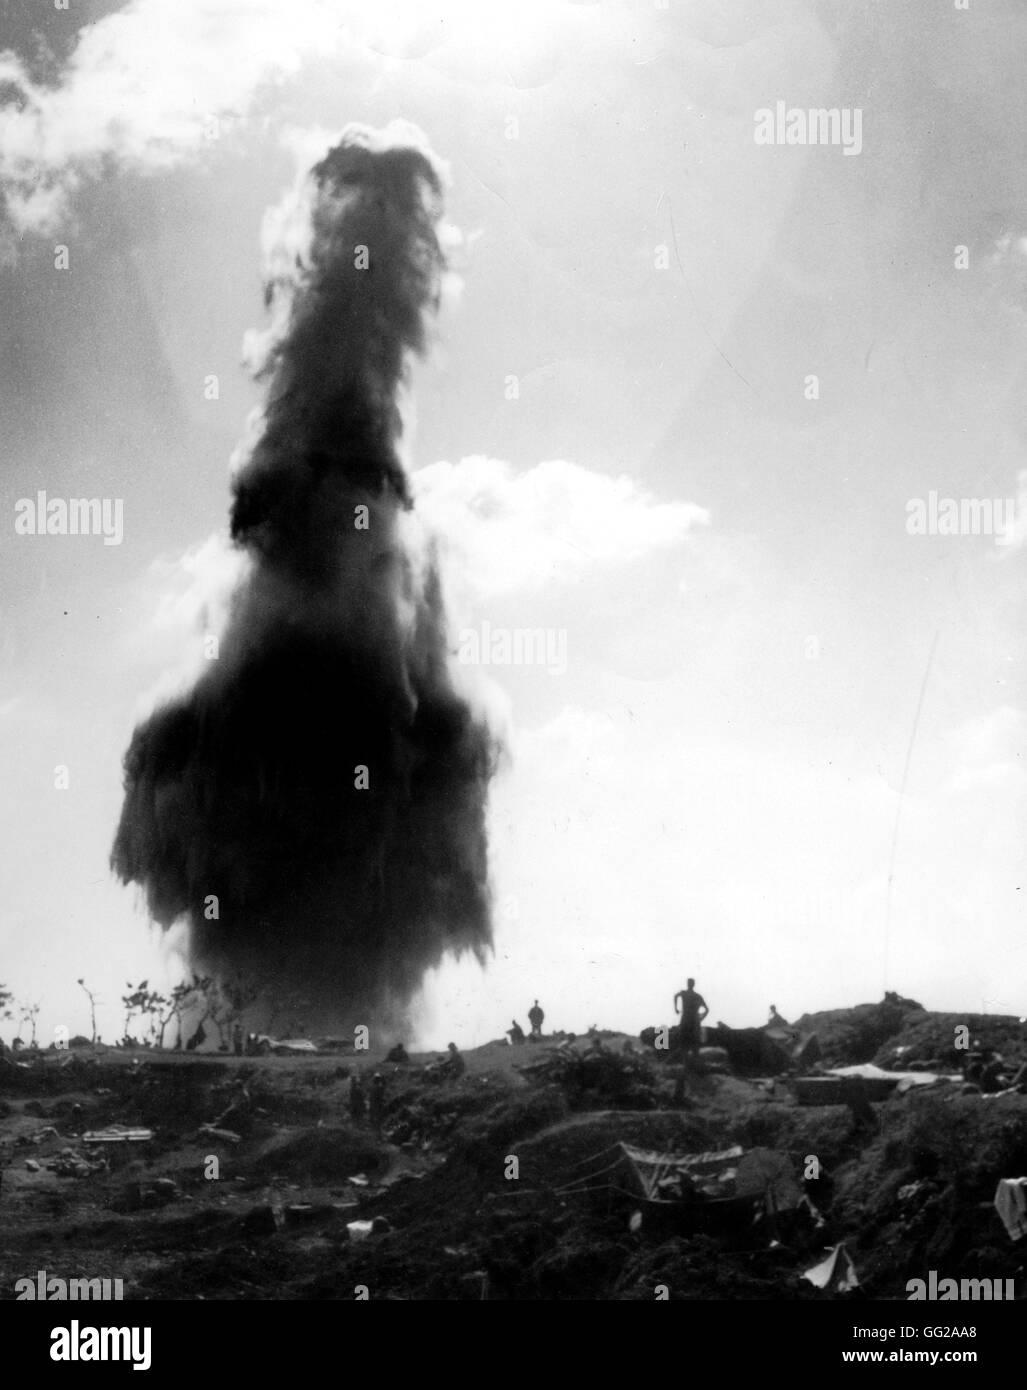 The Pacific War: nuclear explosion in Okinawa 1945 Japan - World War II Washington. National archives - Stock Image